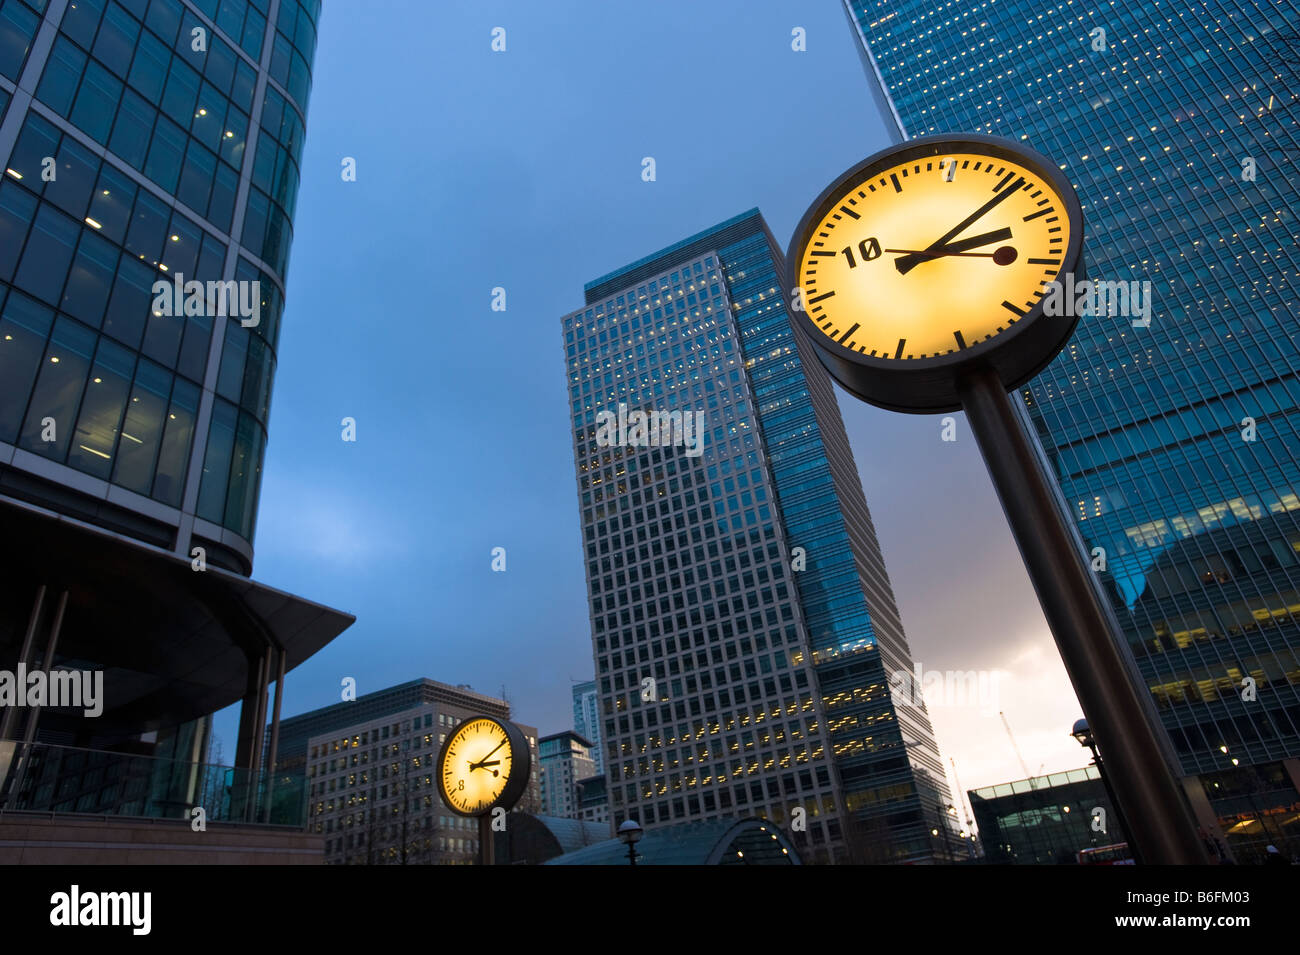 Office blocks in Canary Wharf Docklands E14 London United Kingdom - Stock Image